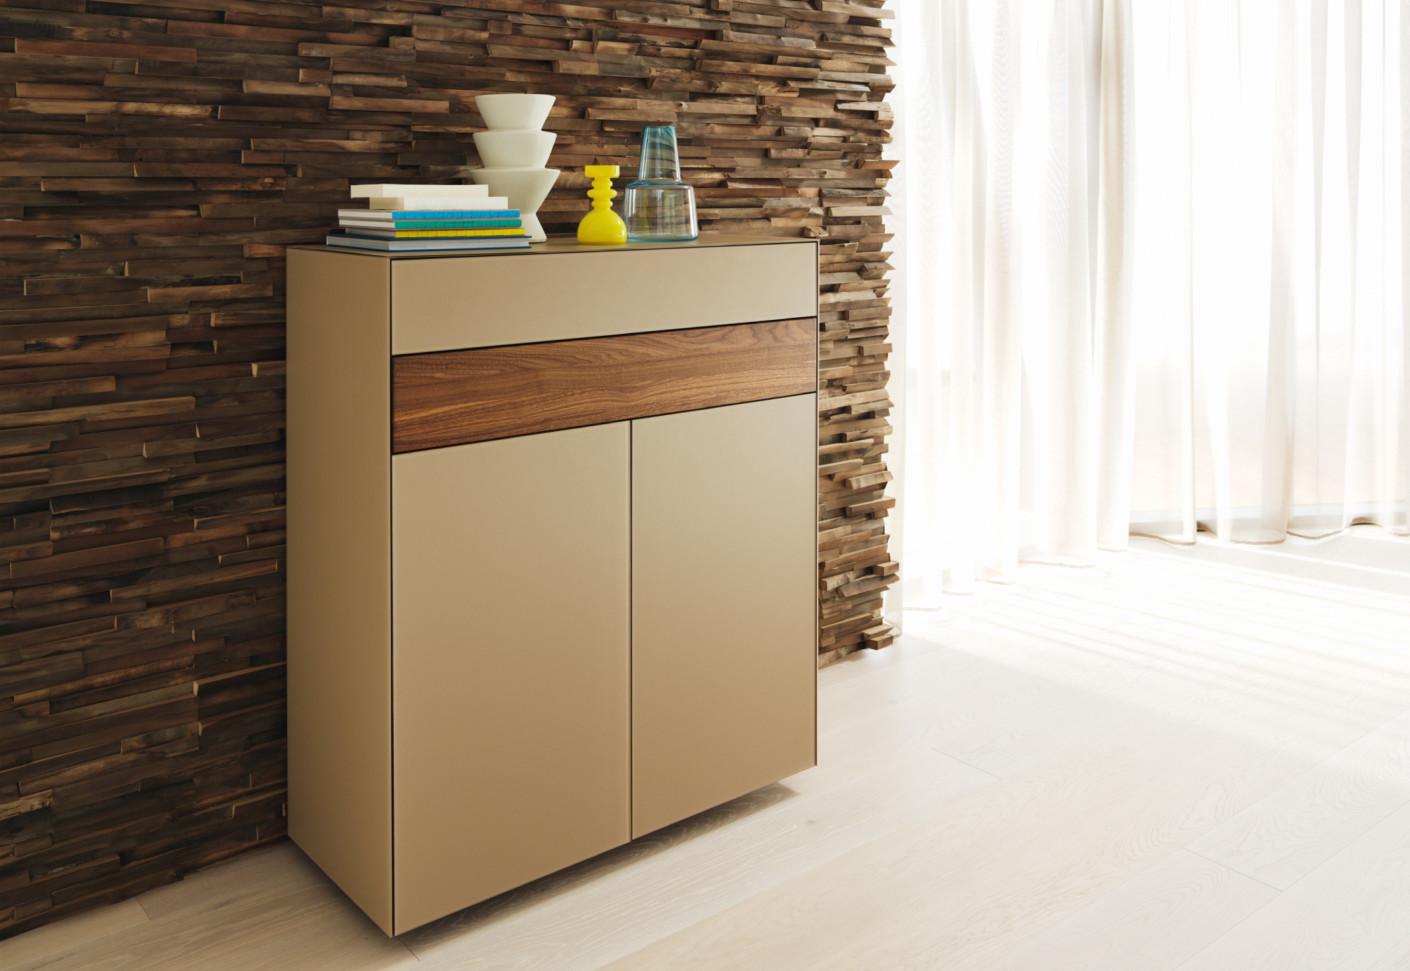 cubus pure schmale kommode von team 7 stylepark. Black Bedroom Furniture Sets. Home Design Ideas